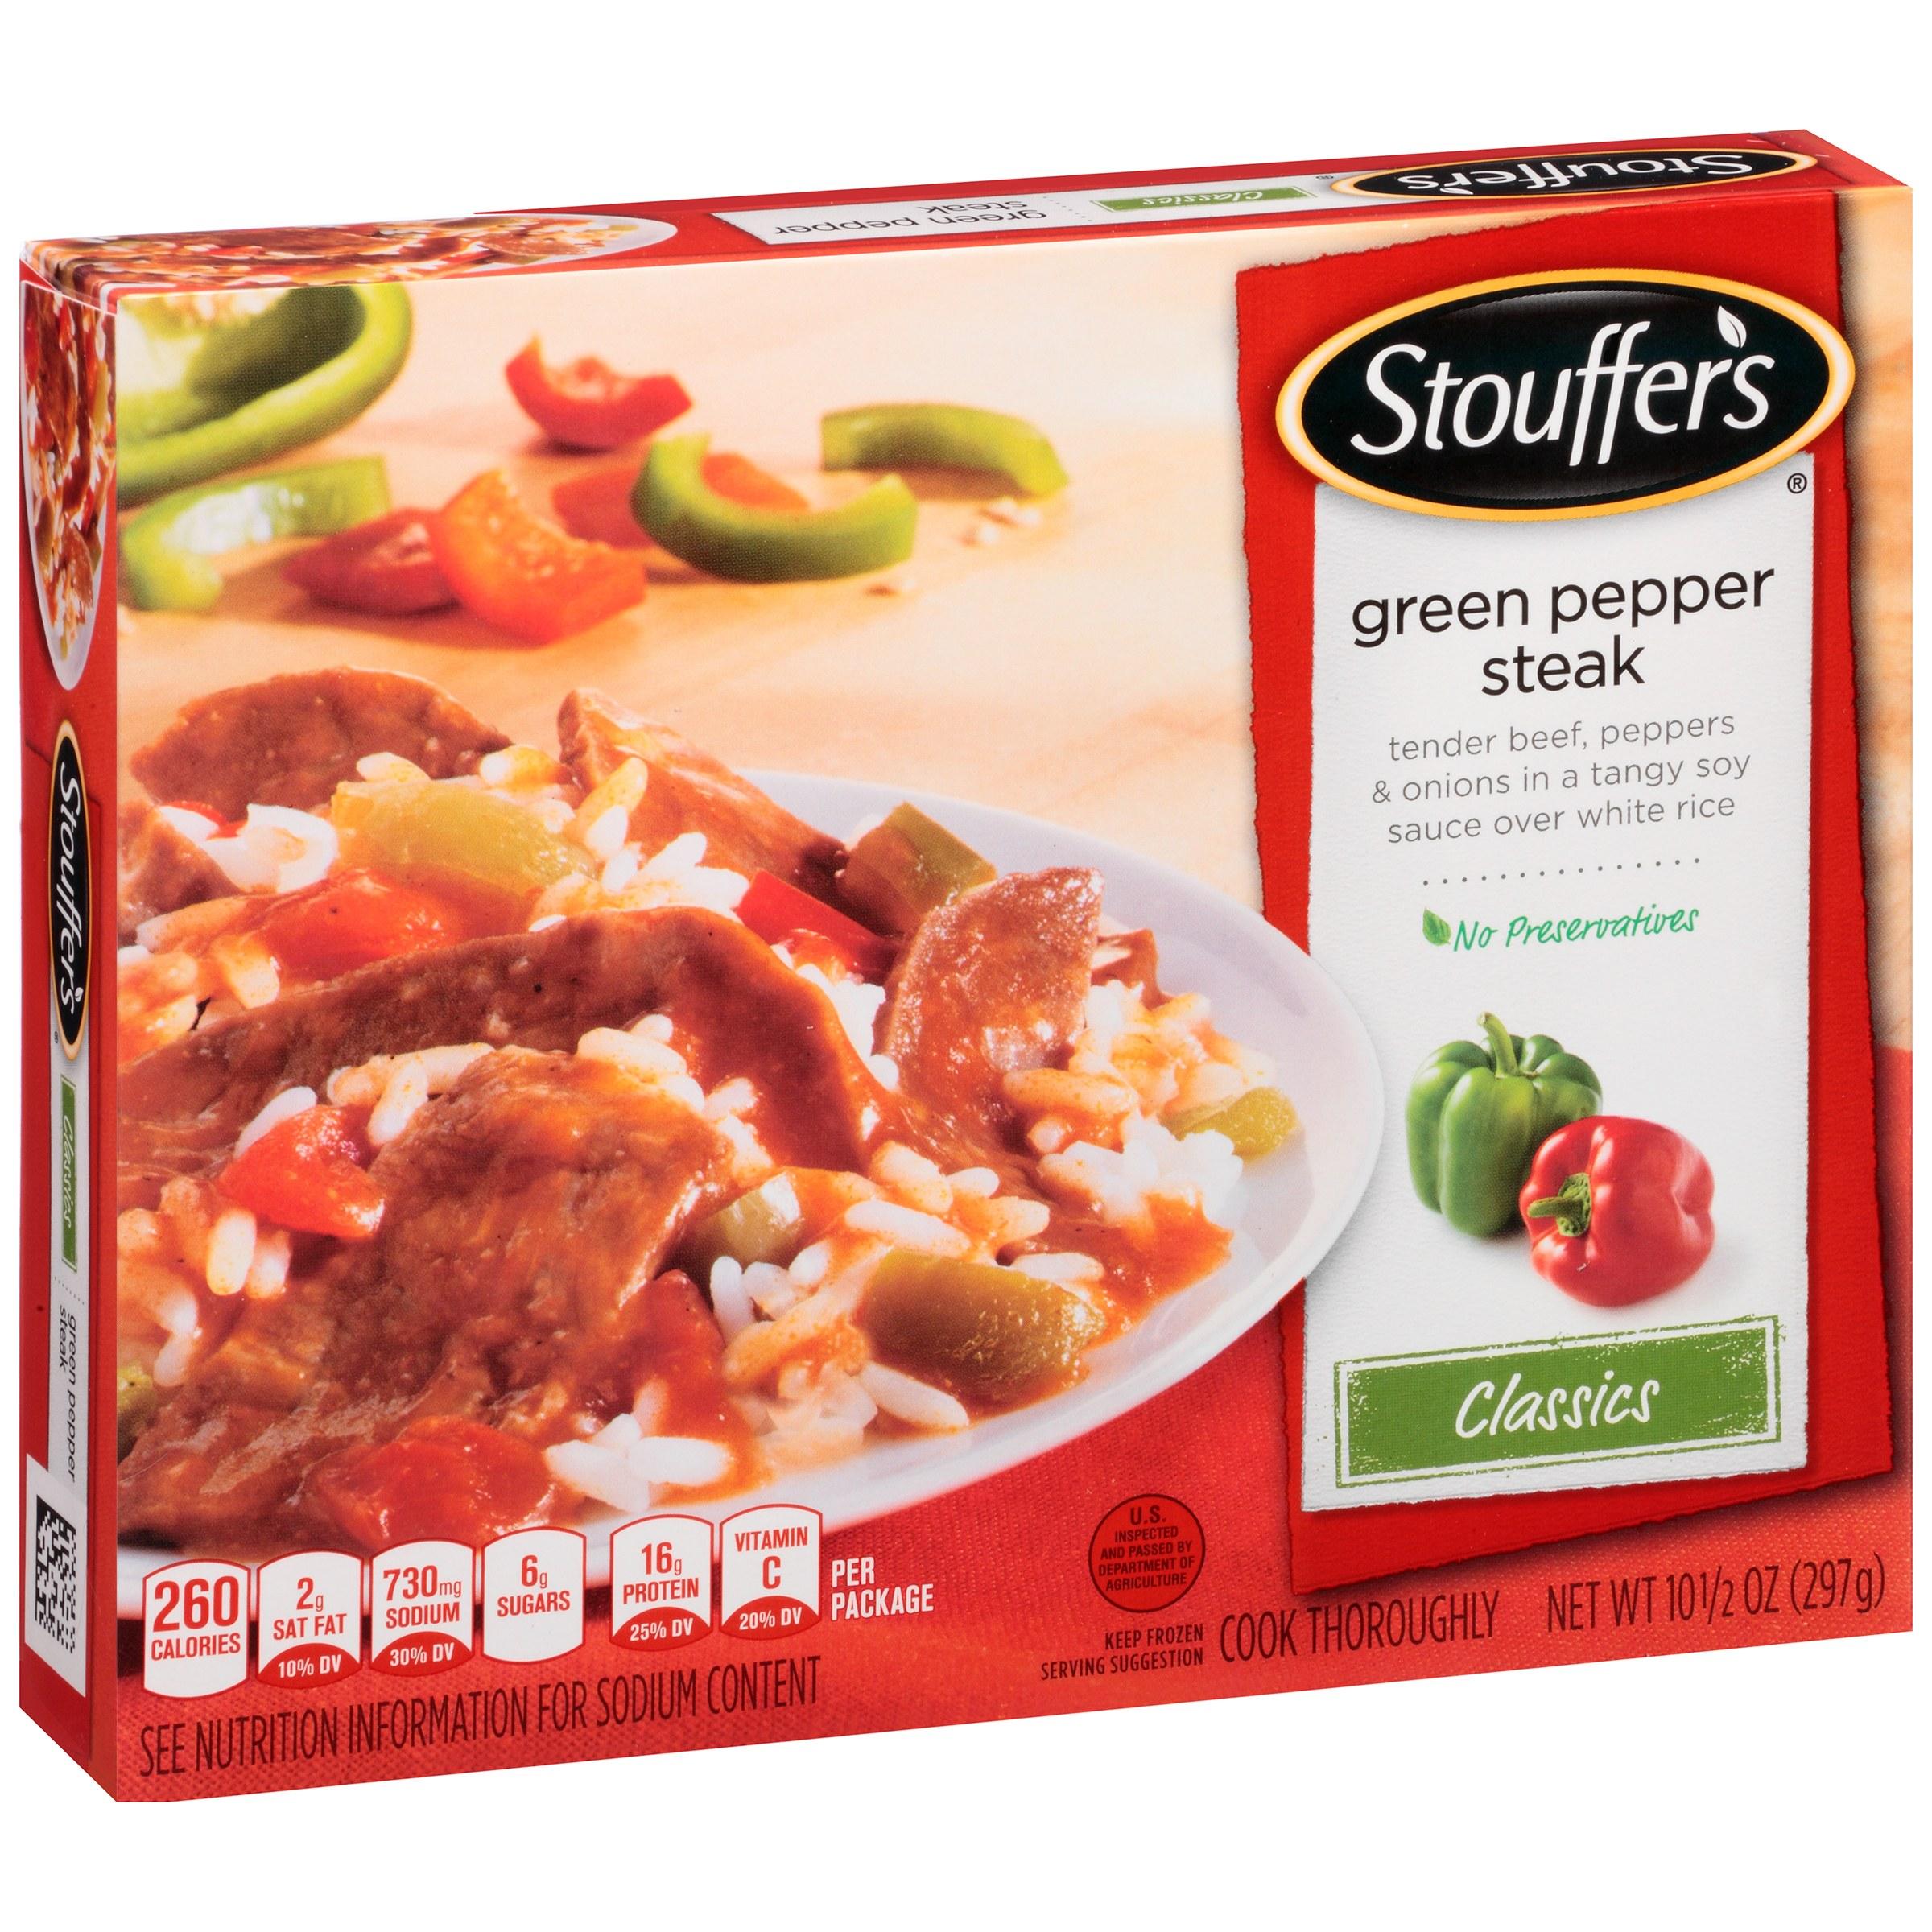 STOUFFER'S Classics Green Pepper Steak 10.5 oz Box